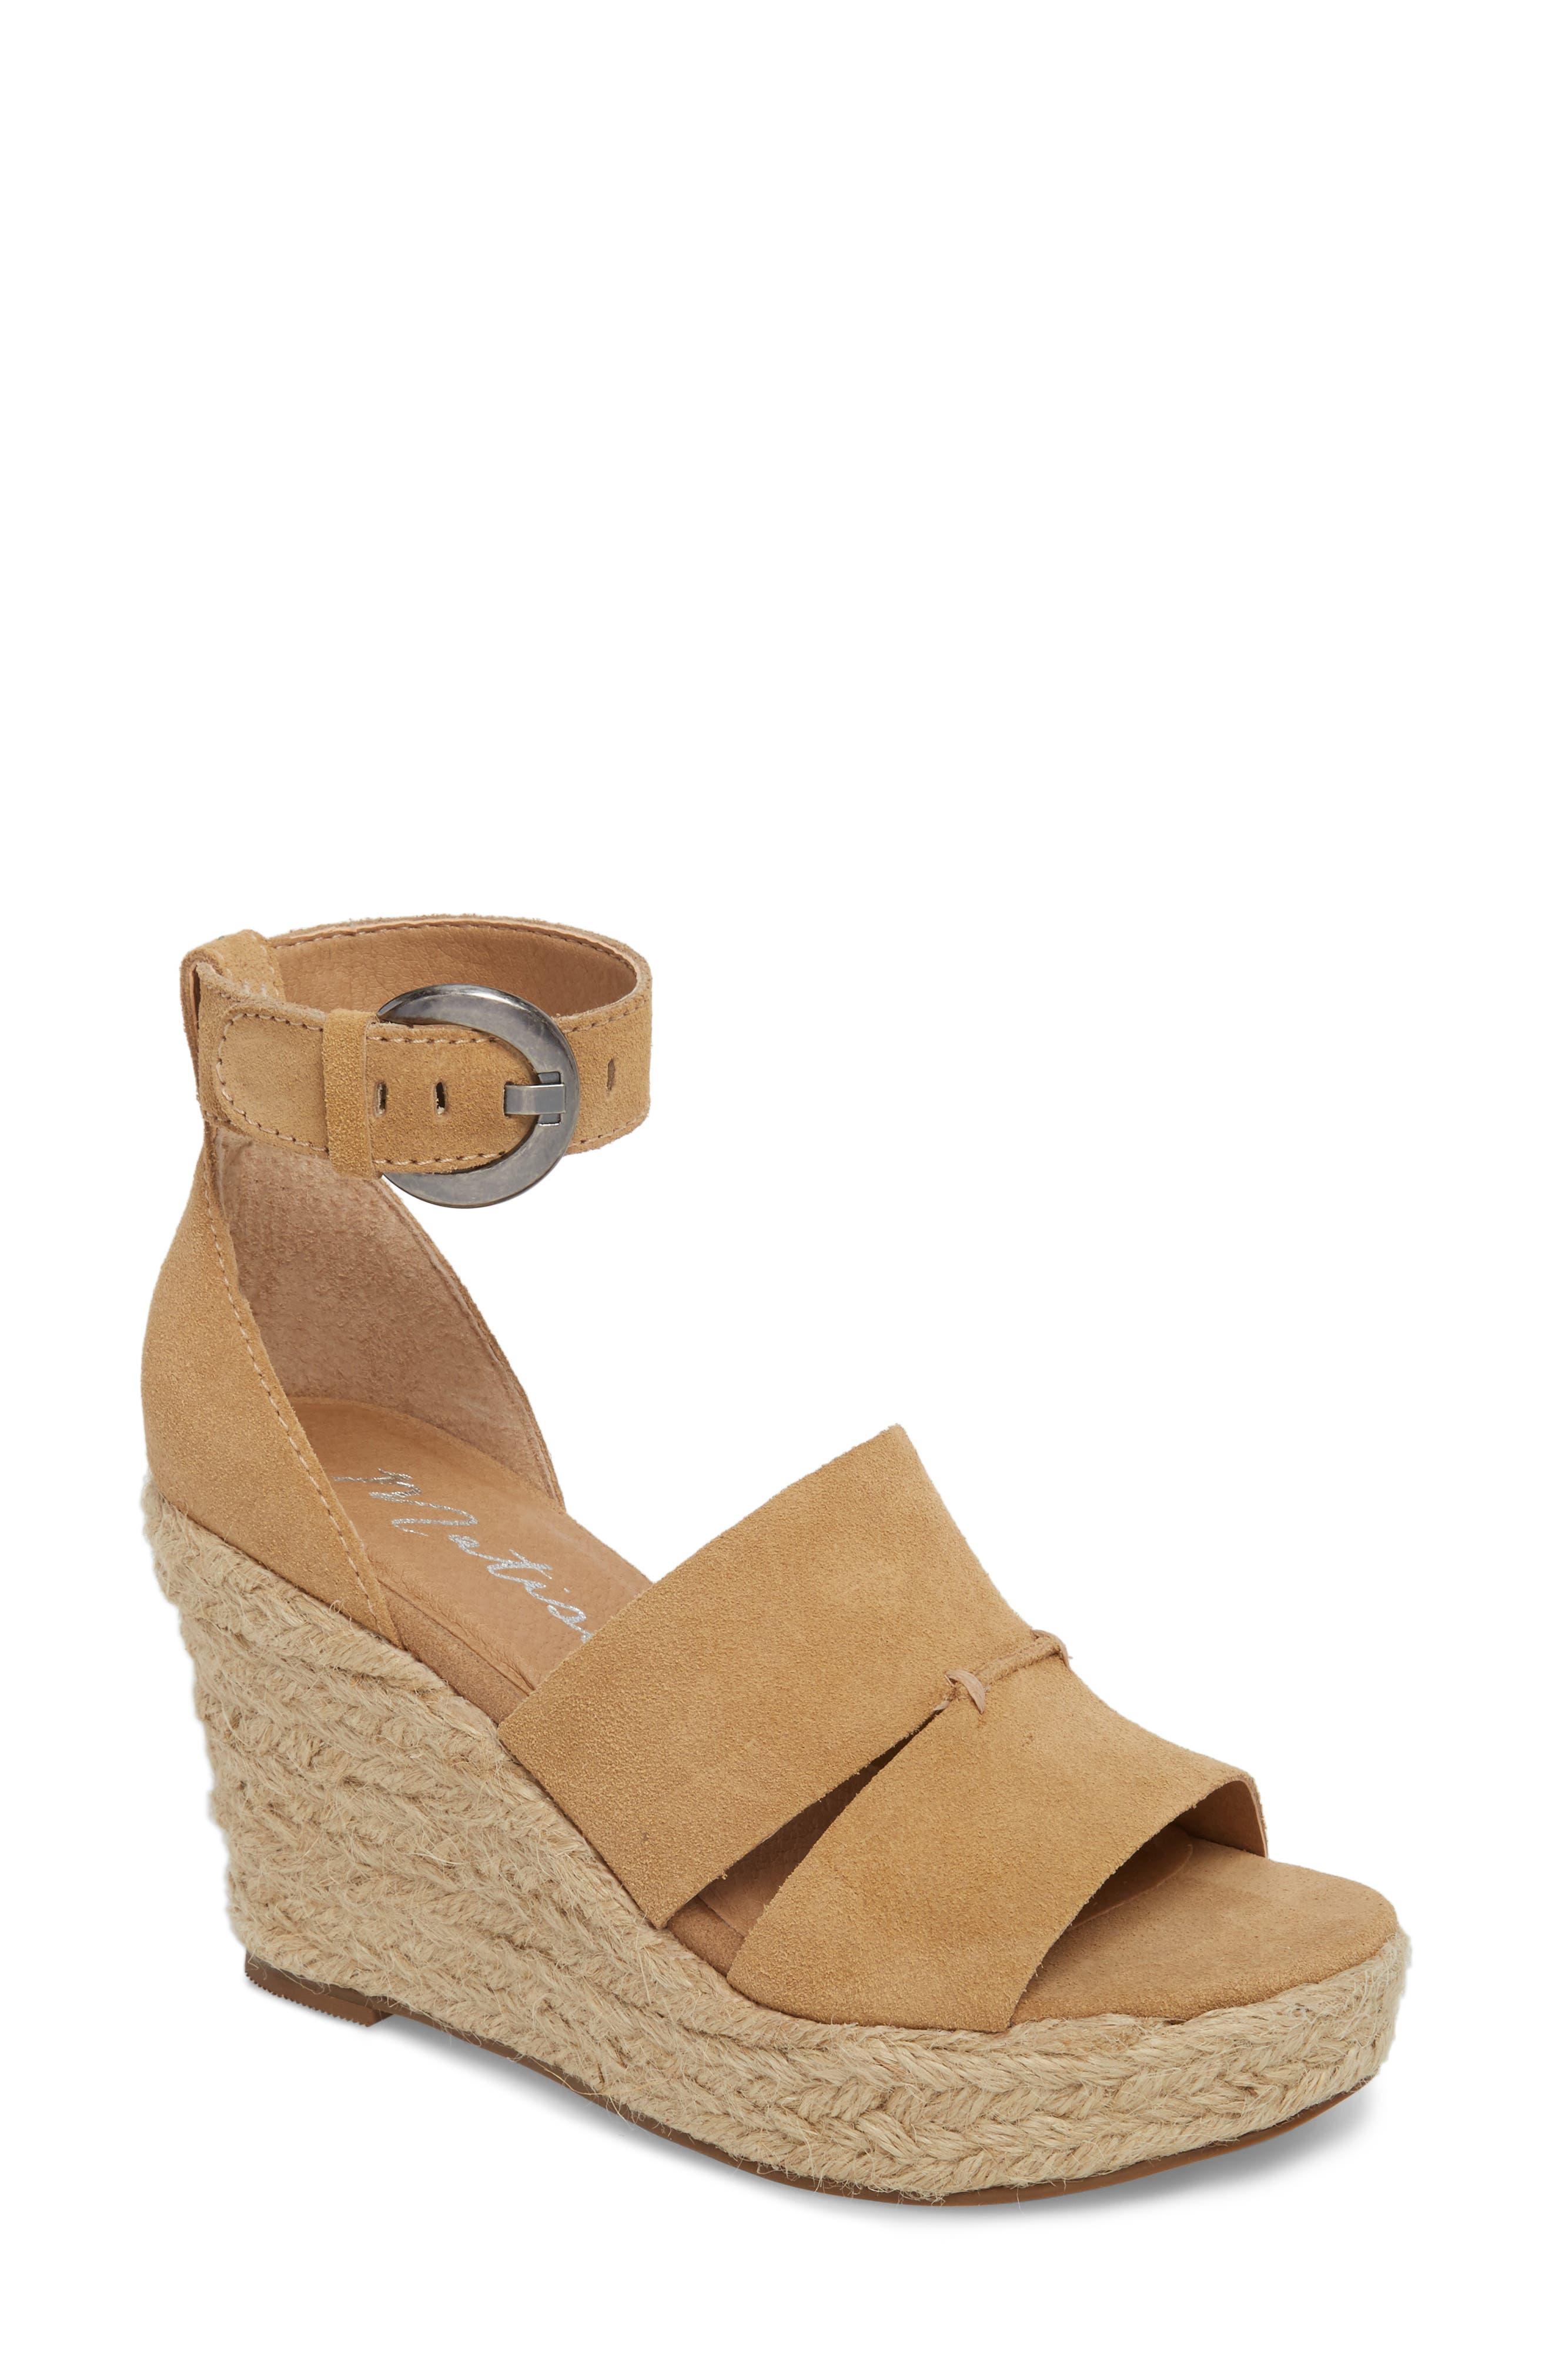 Matisse Cha Cha Espadrille Wedge Sandal (Women)